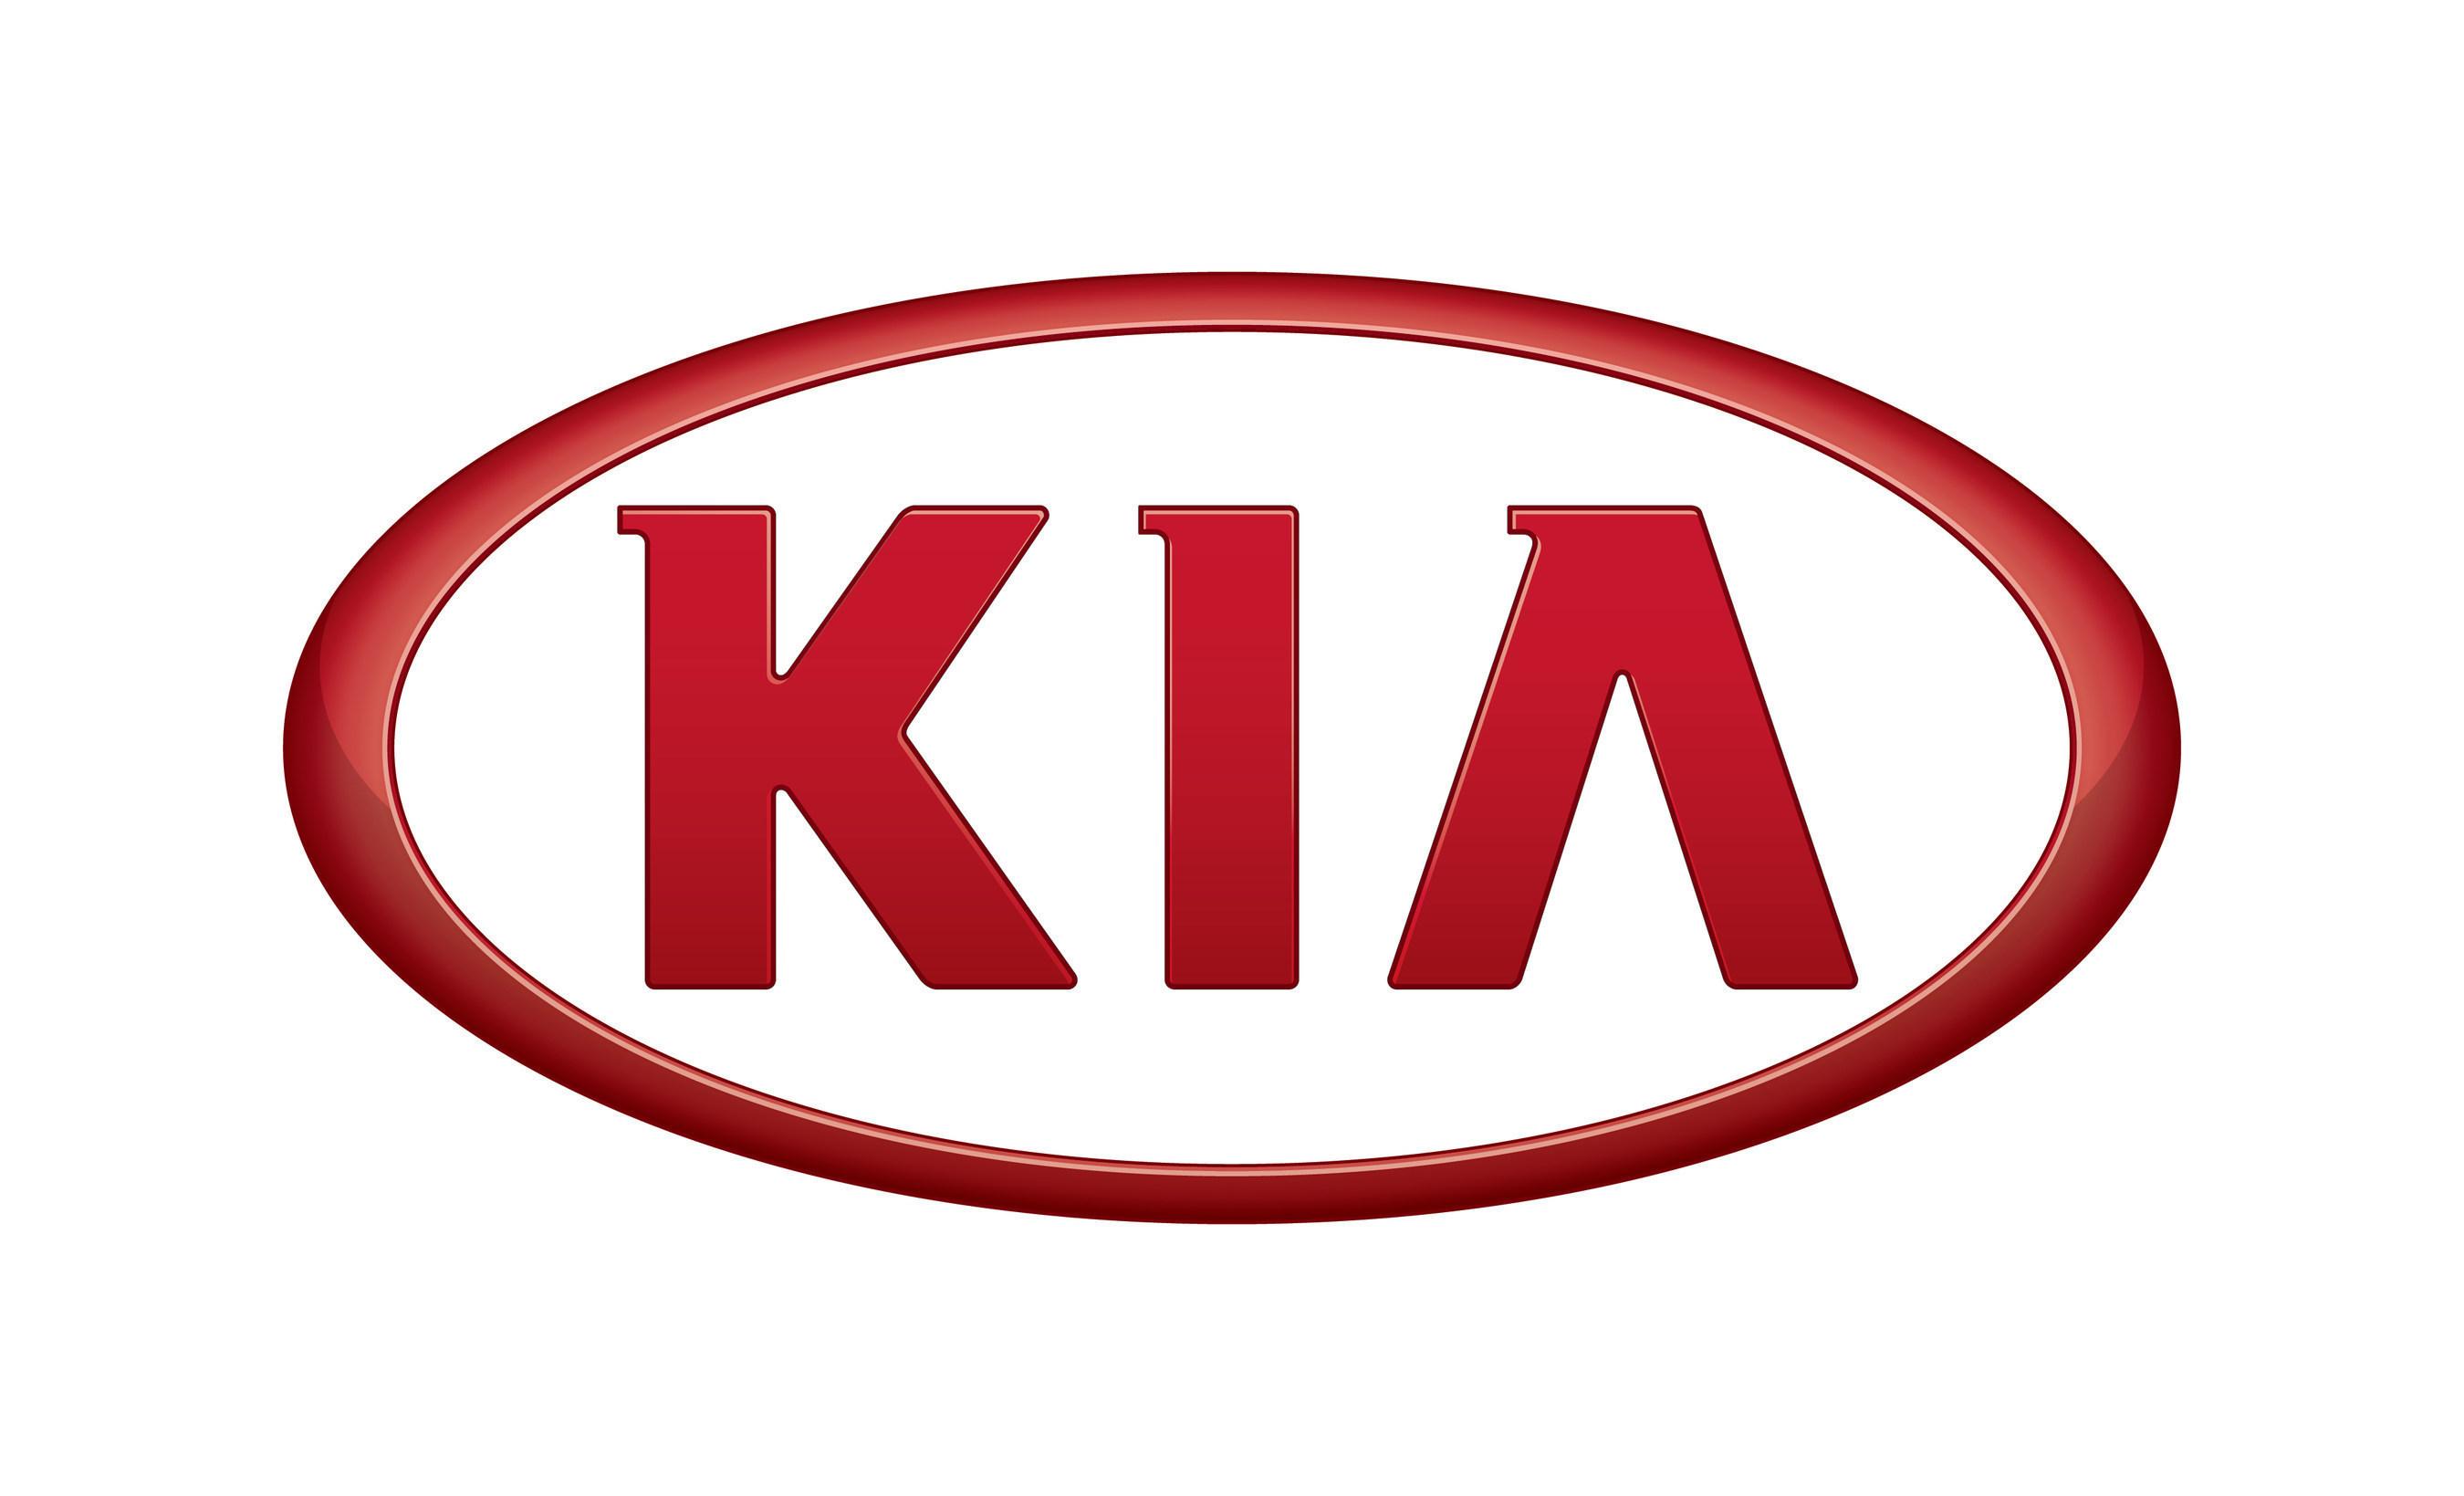 Kia Announces Philanthropic Partnership With Hire Heroes USA to Help Military Veterans Find Civilian Jobs